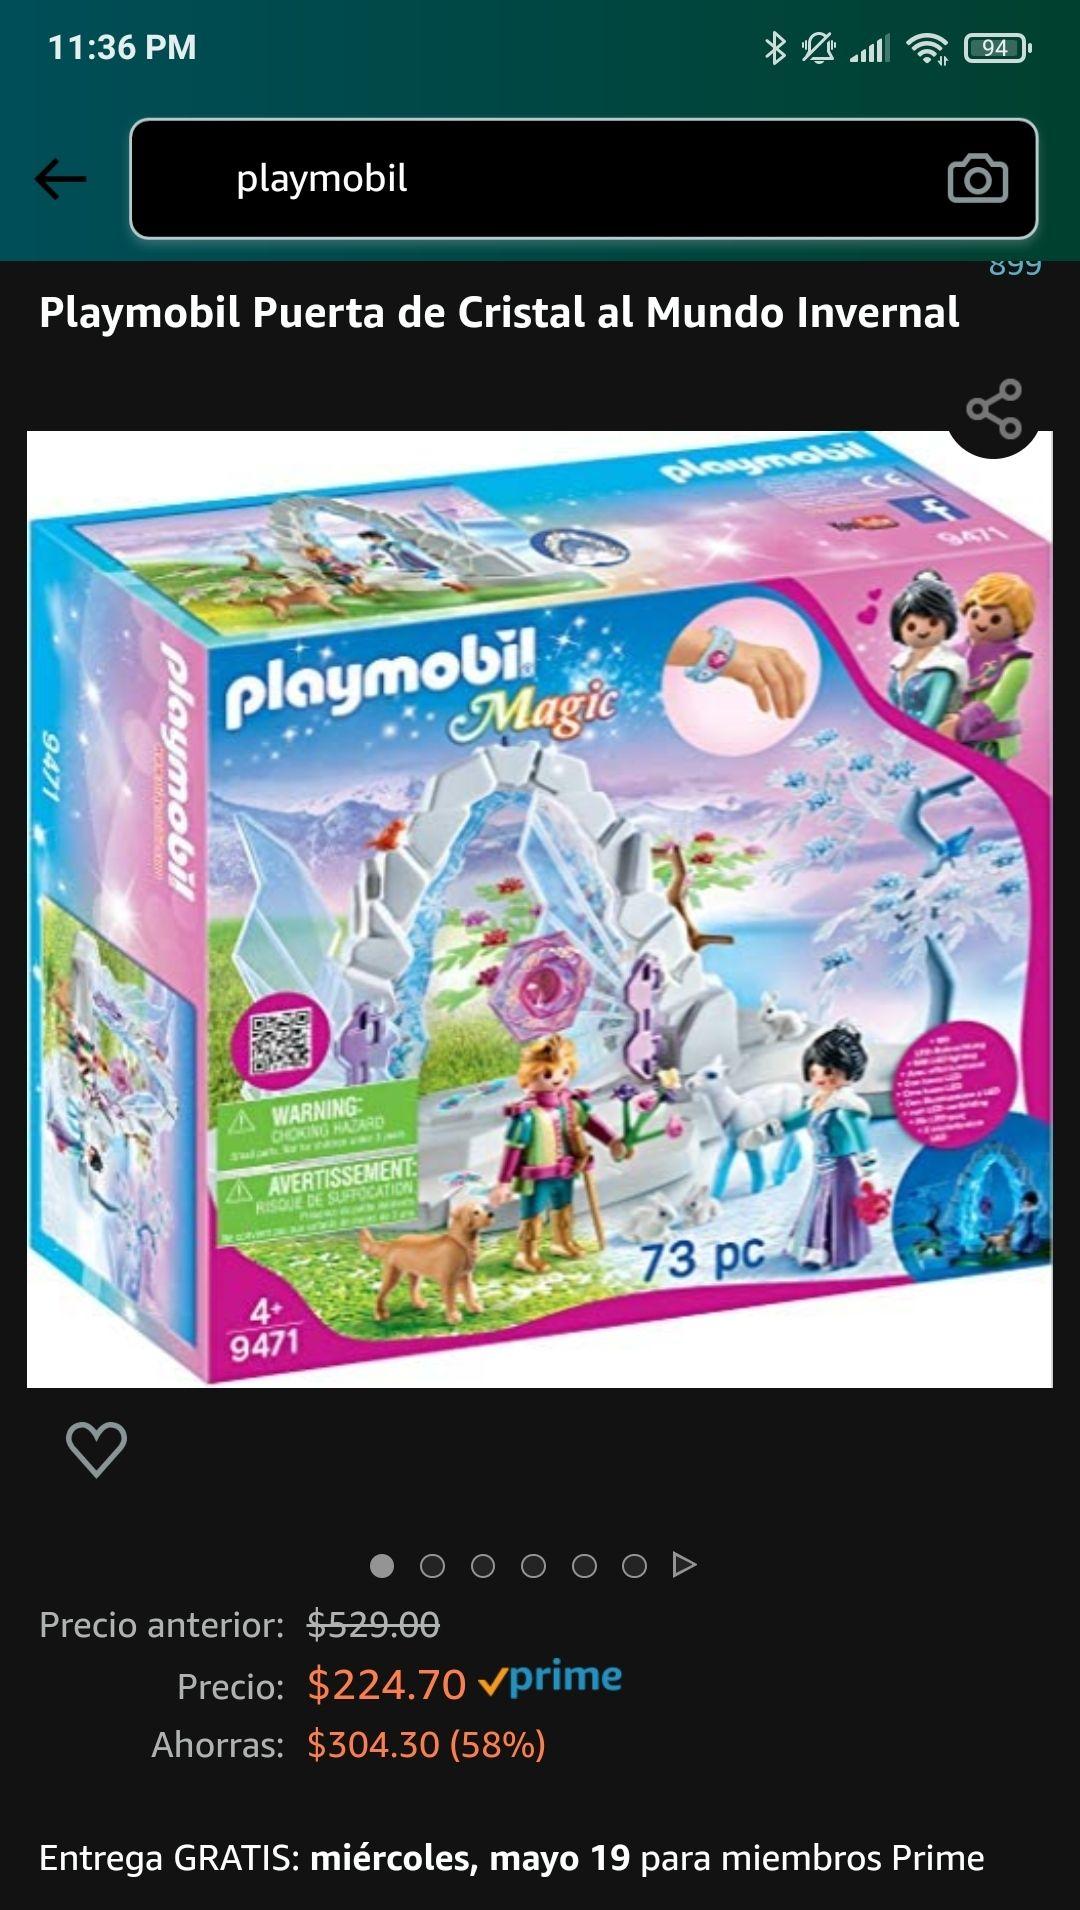 Amazon: Playmobil: puerta de cristal al mundo invernal